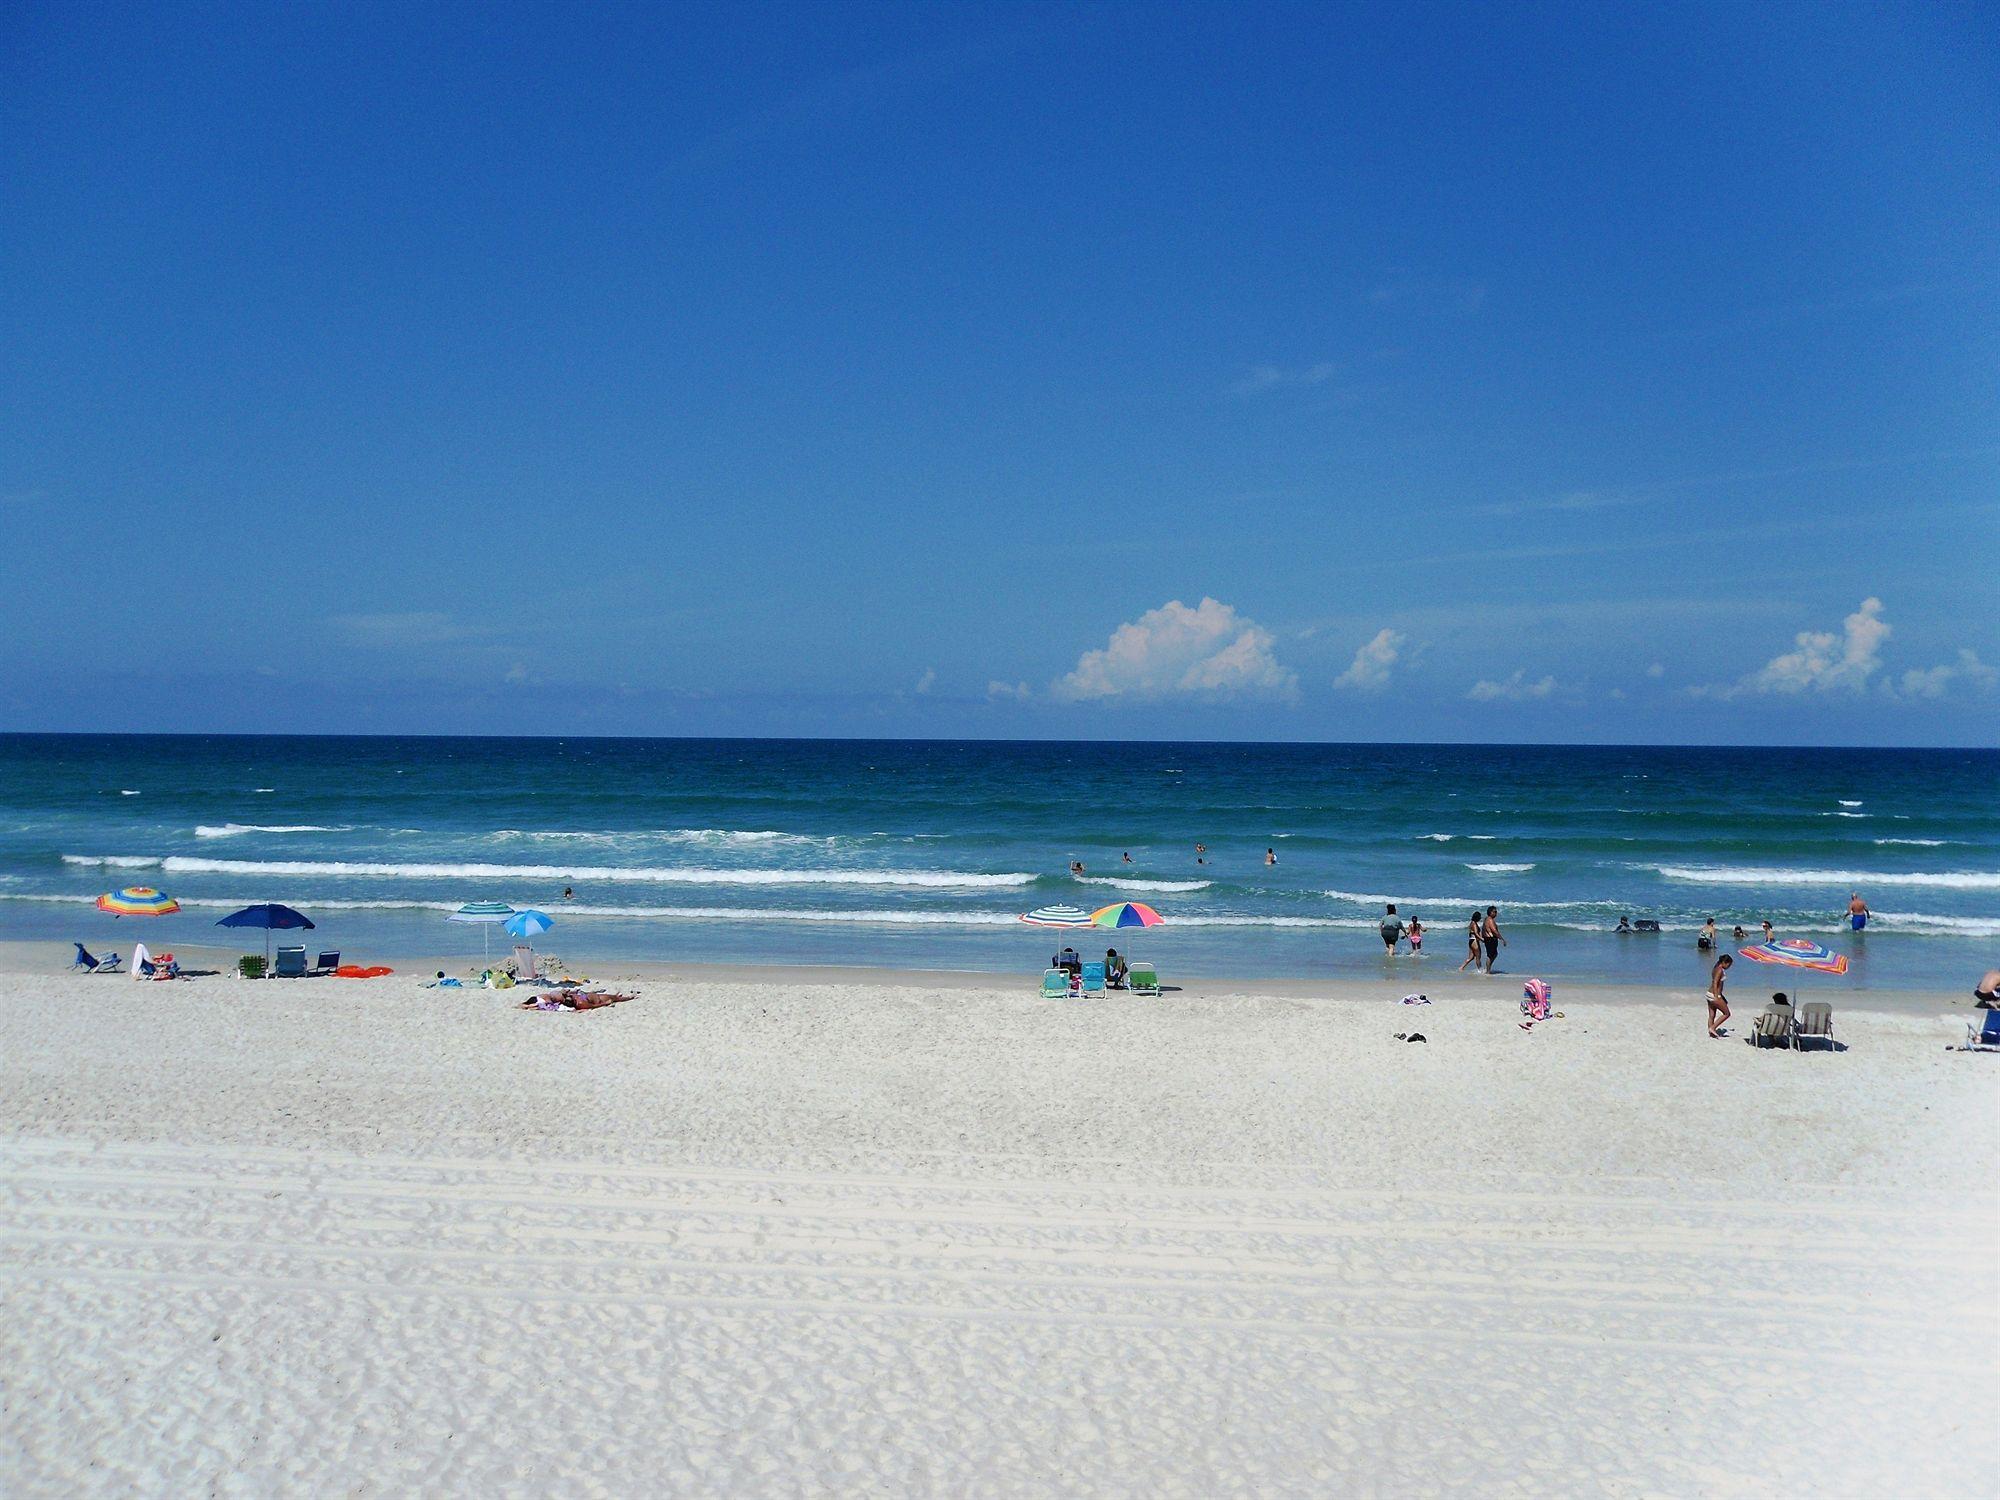 Atlantic Cove in Ormond Beach, FL